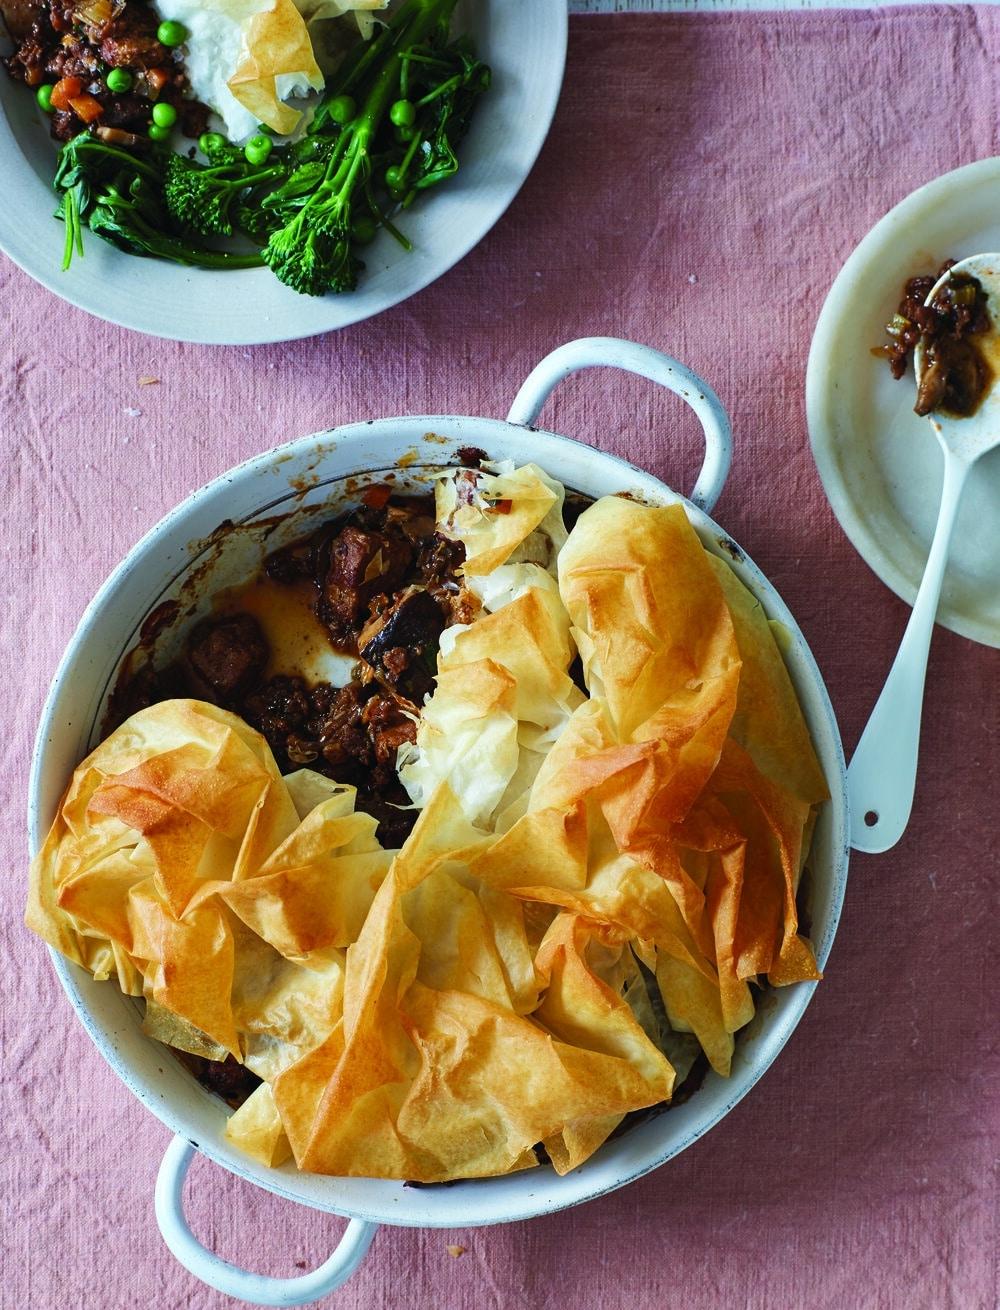 BOSH!!! A Meaty Mushroom Pie That Is Totally Vegan Friendly